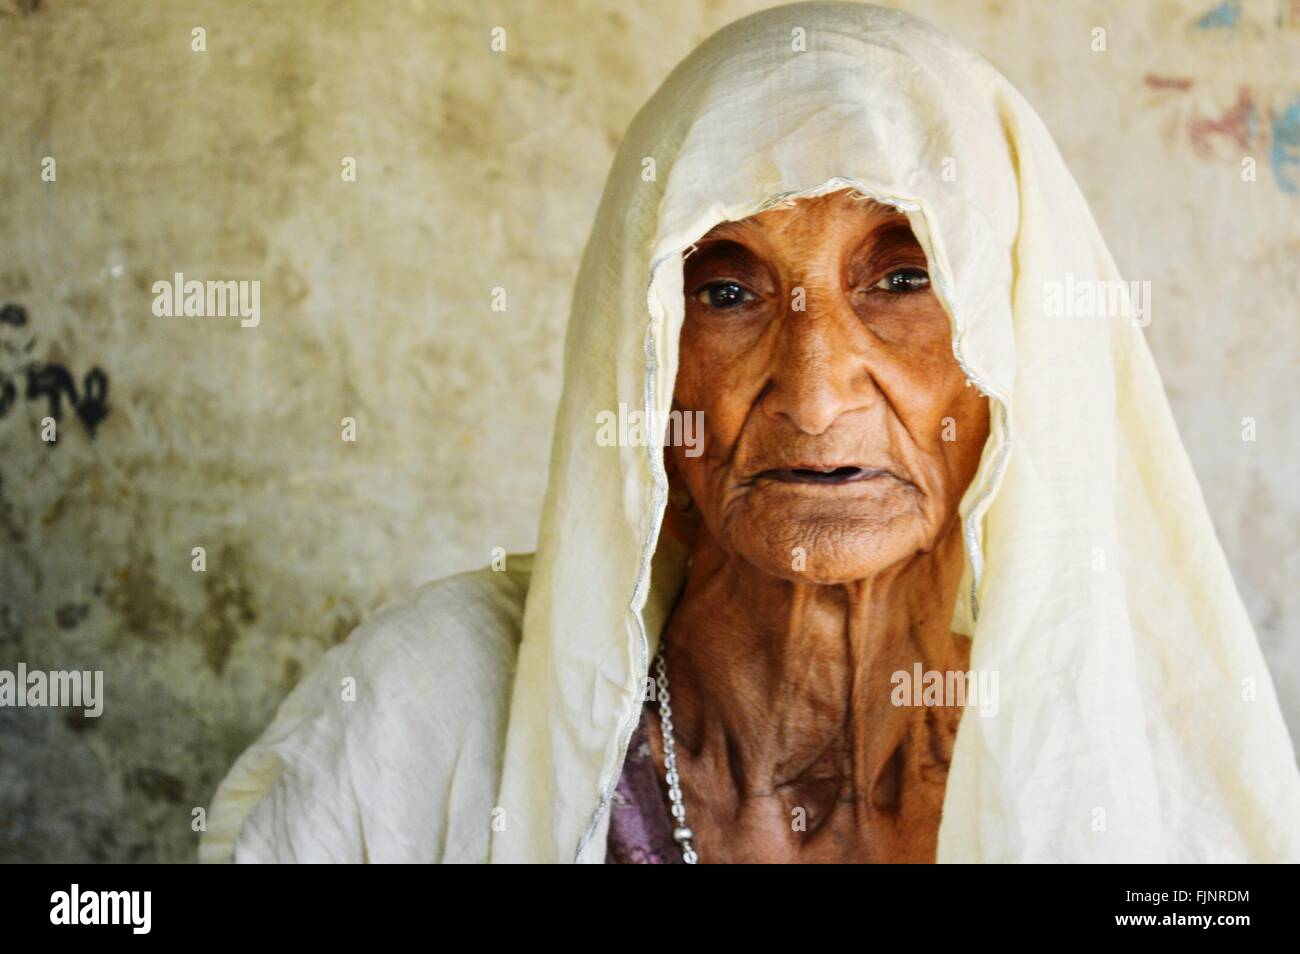 Close-Up Portrait Of Senior Woman - Stock Image